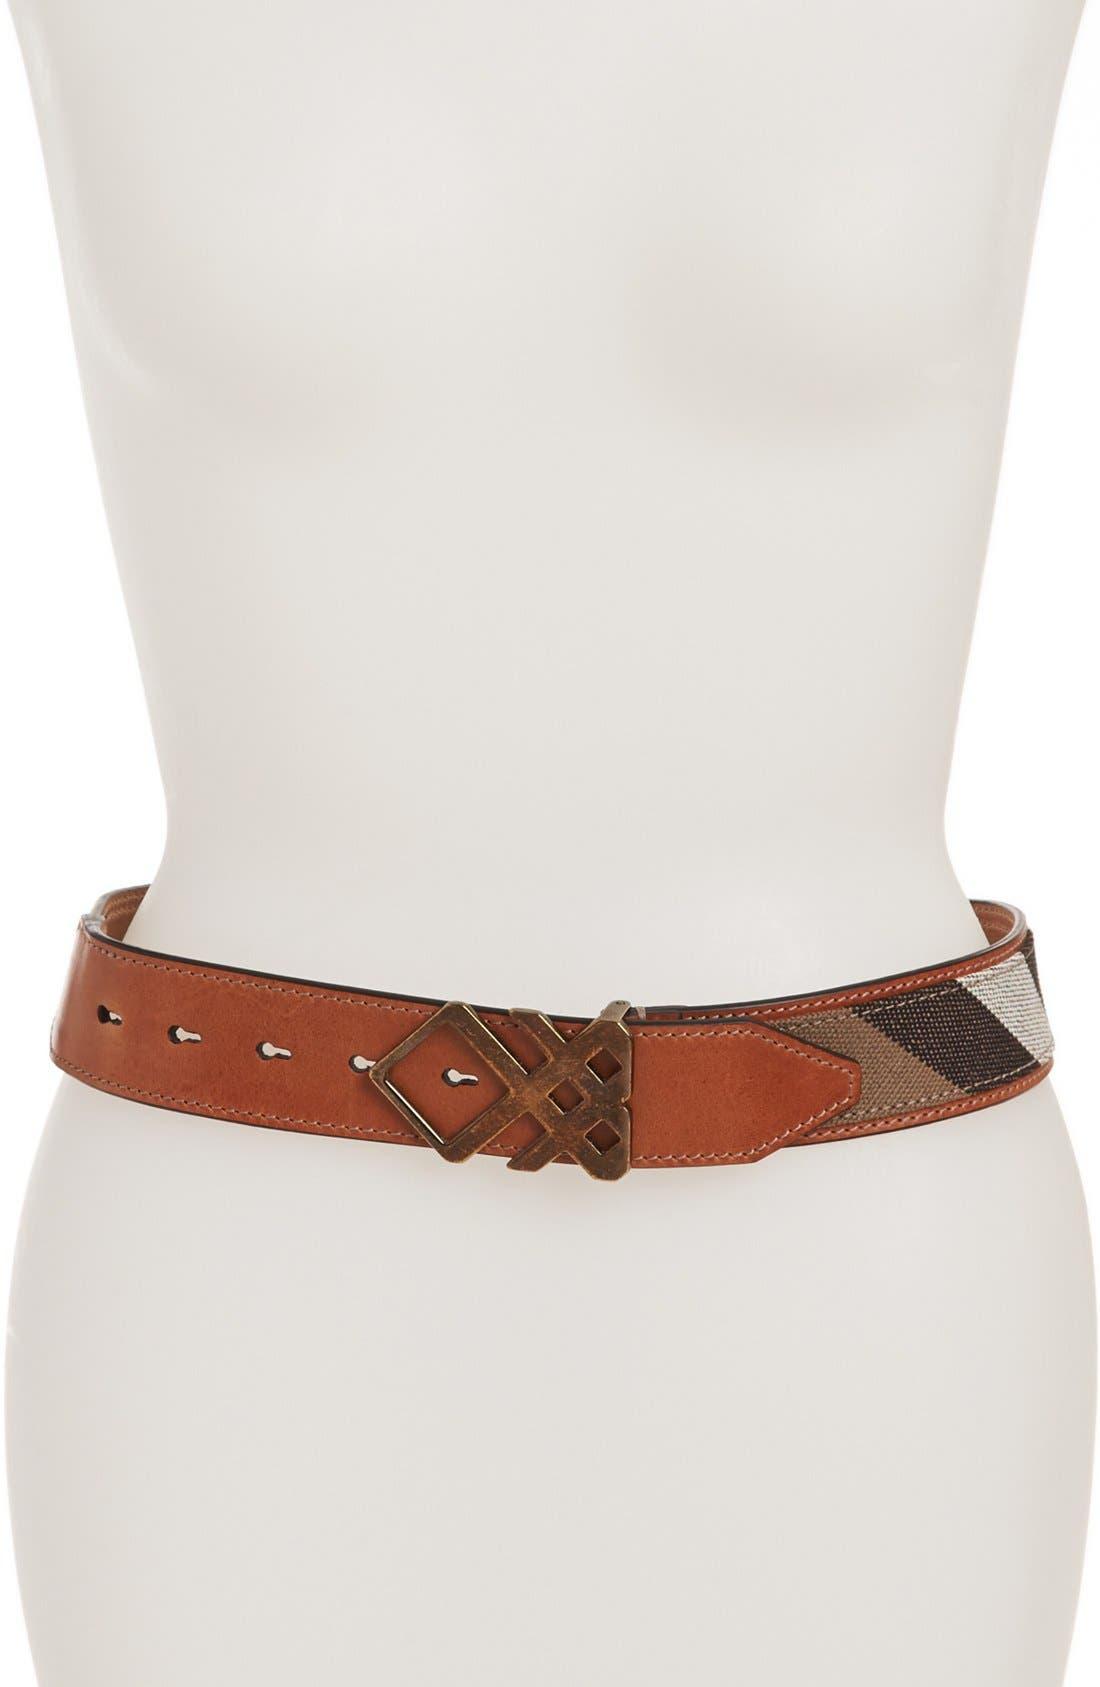 Main Image - Burberry Check Leather Trim Belt